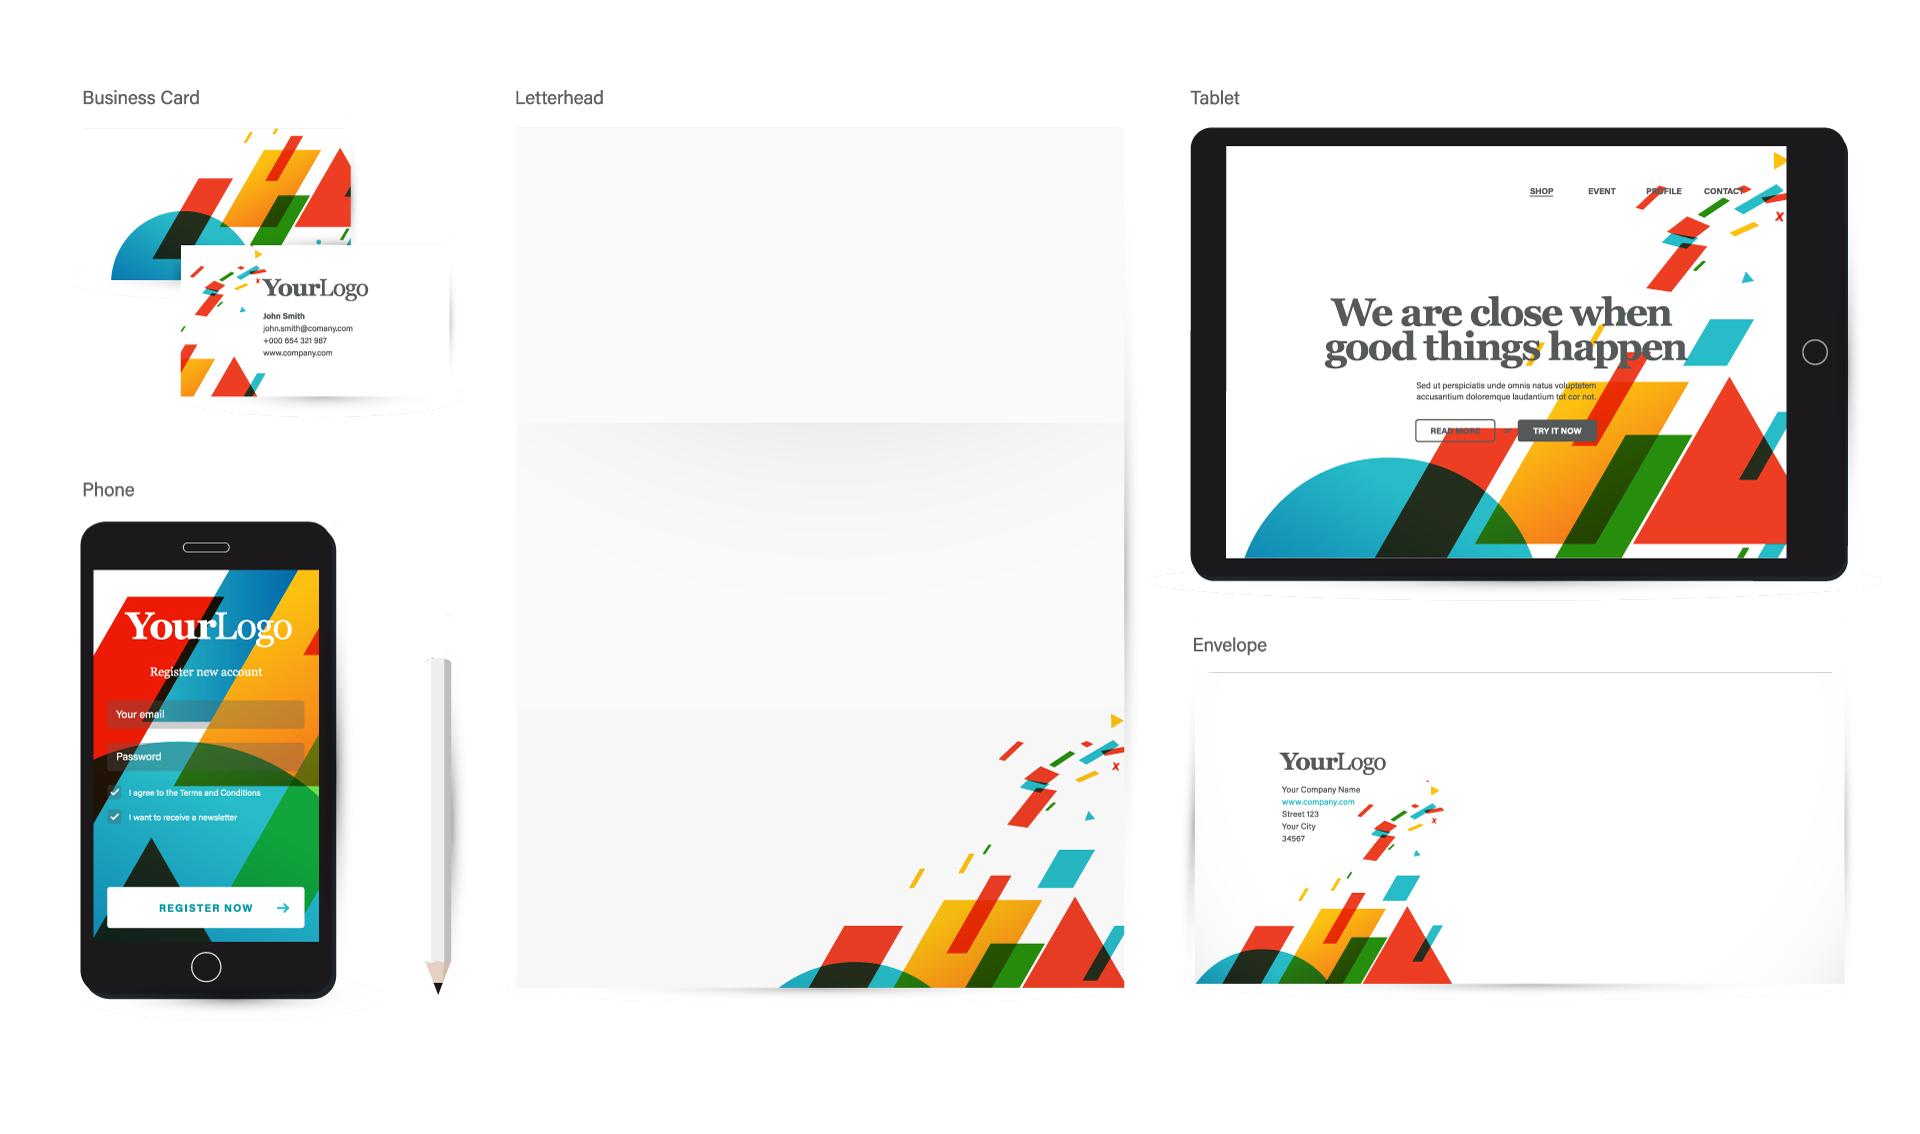 Professional Web Design Example - website business card letterhead design